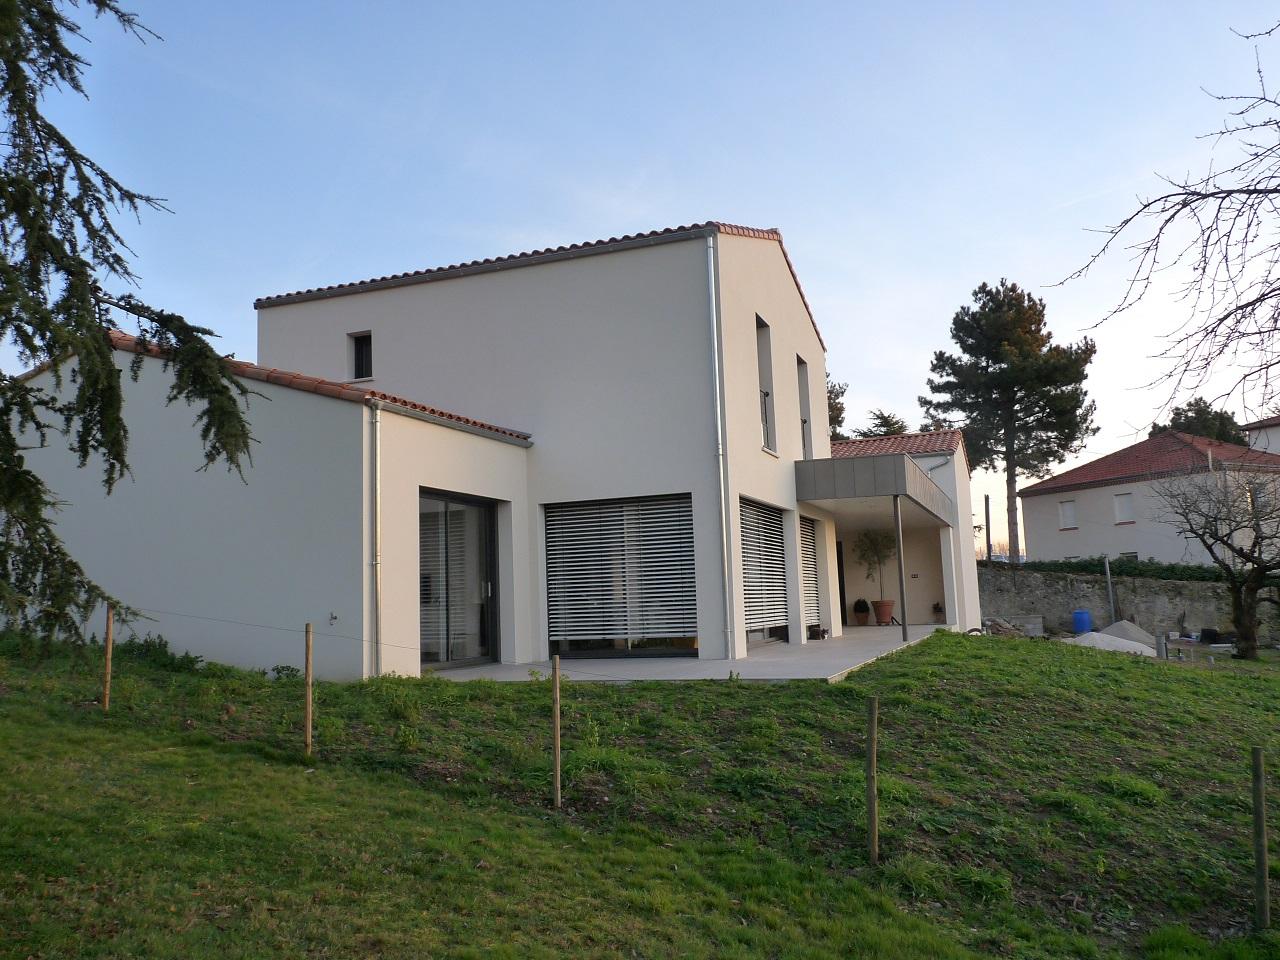 3A REDOIS-SURGET Architectes Treillieres